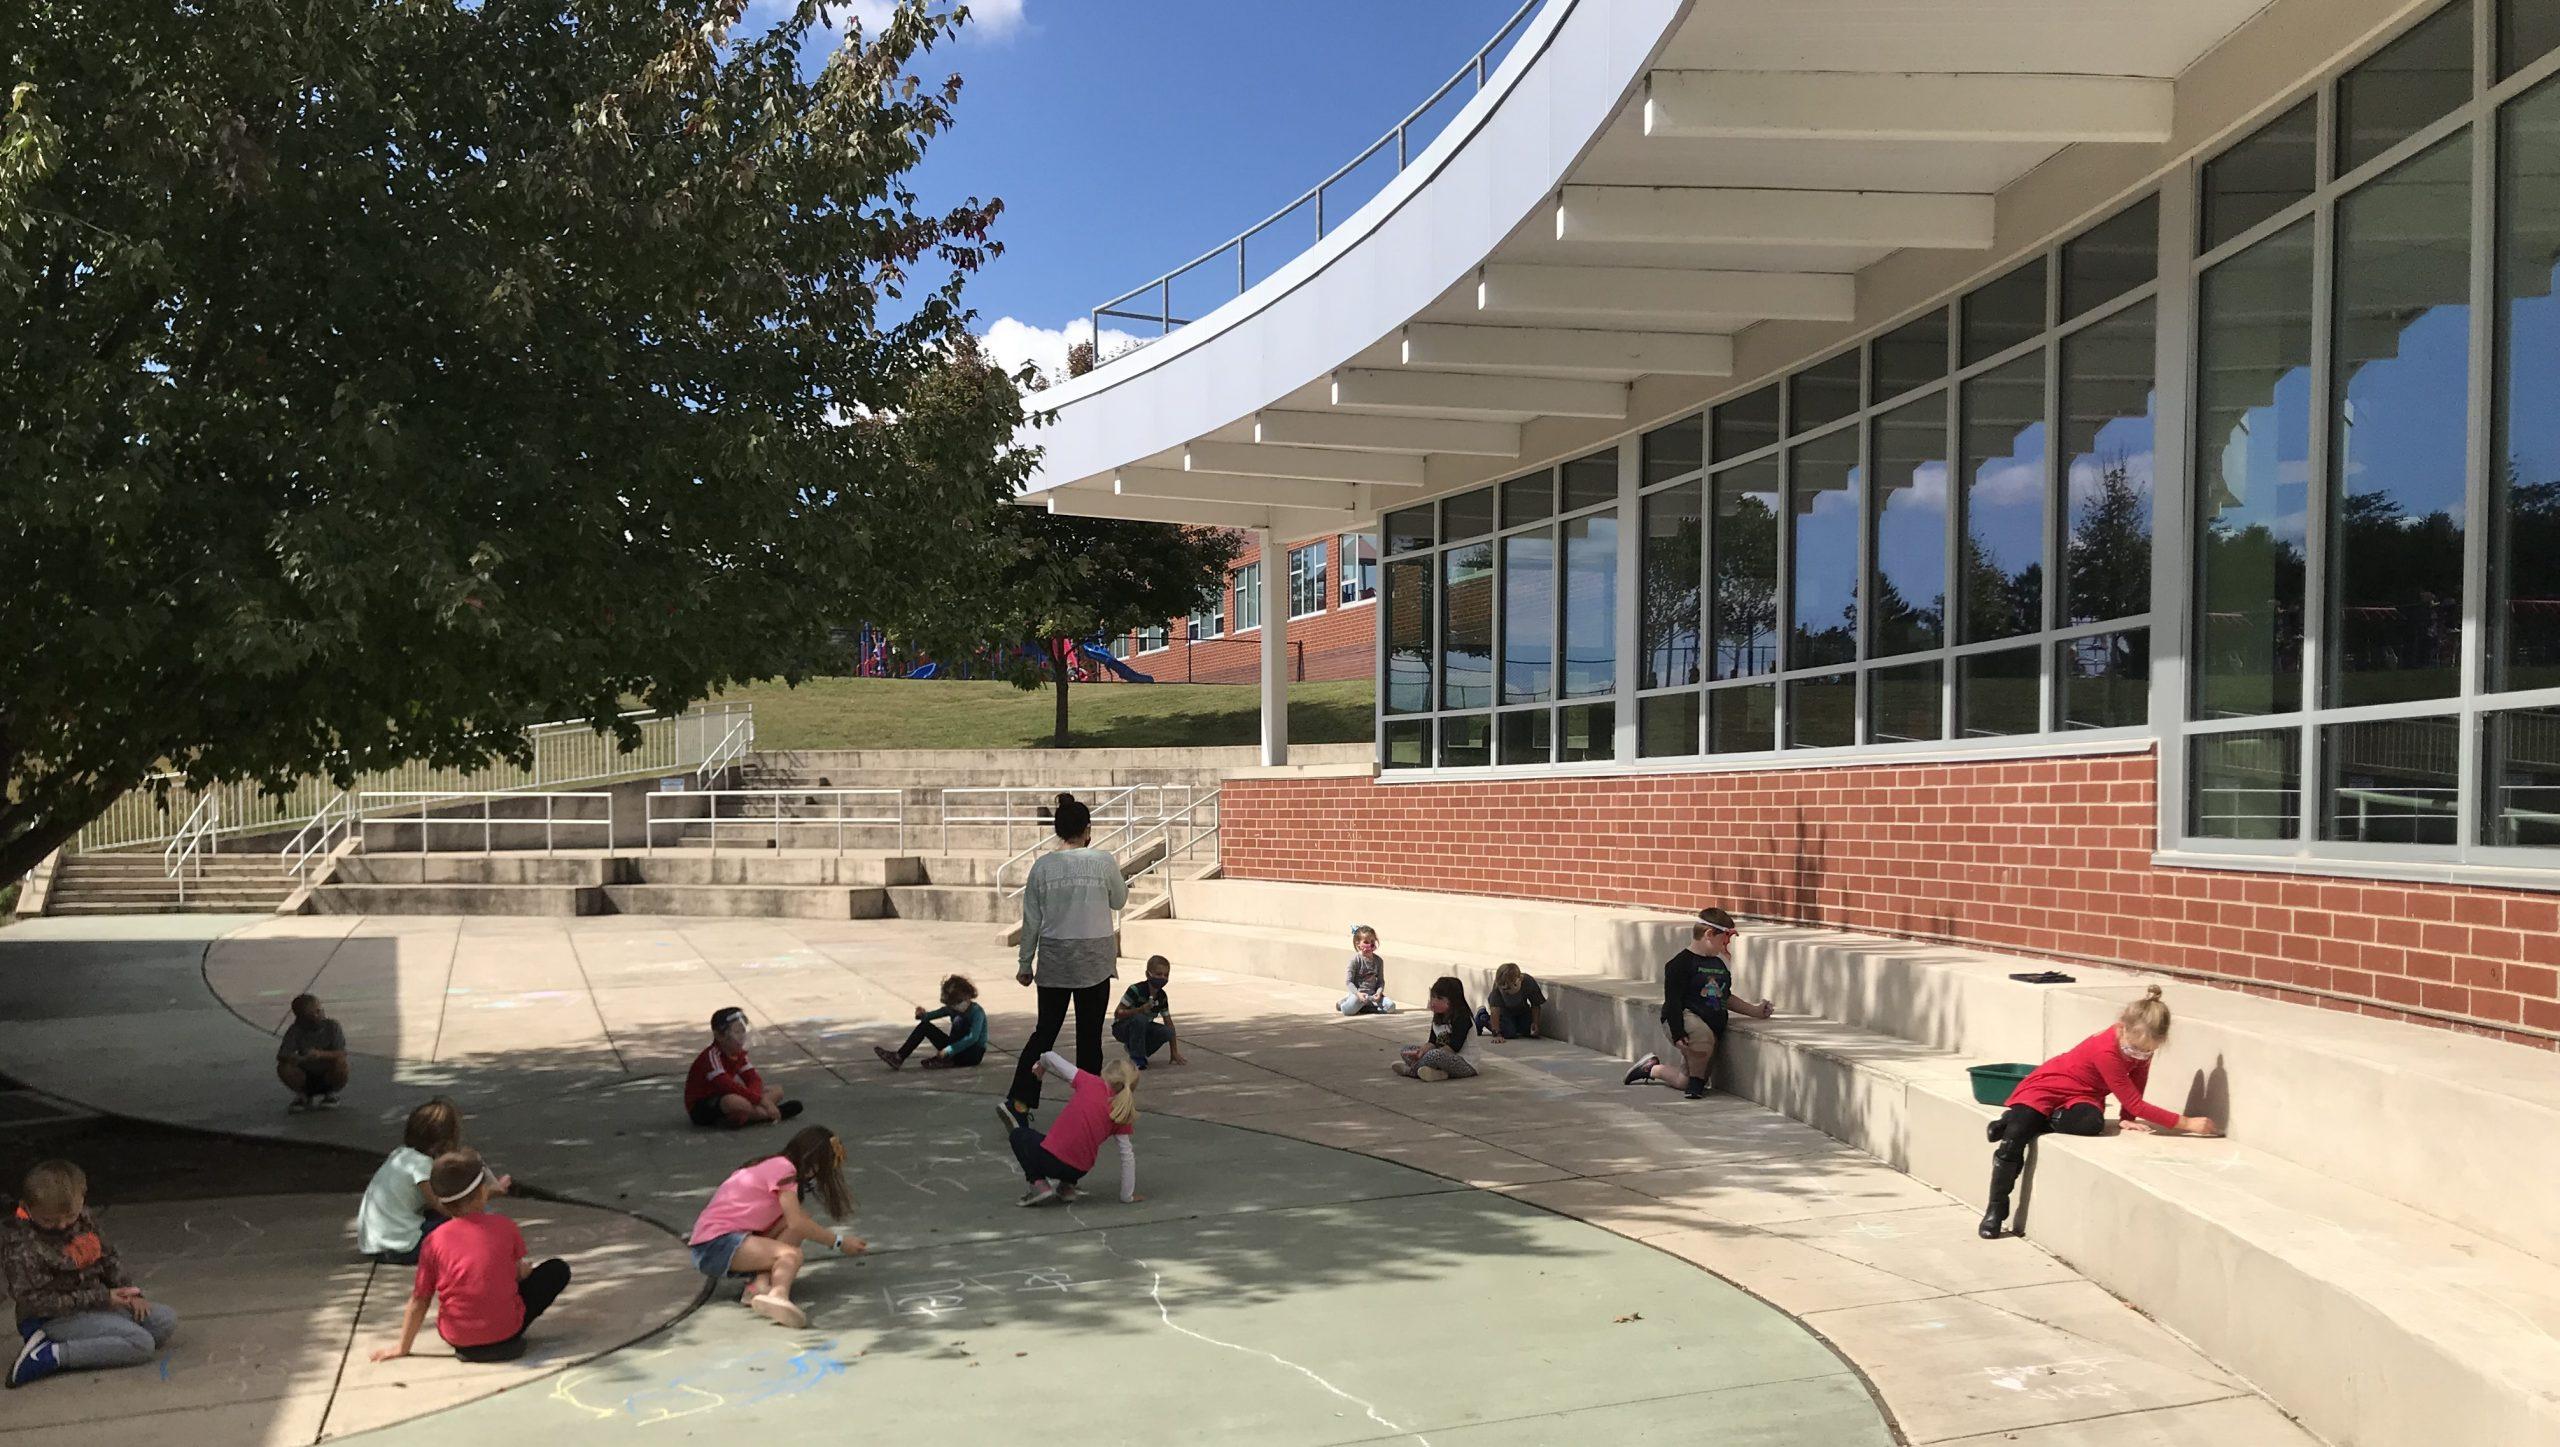 Elementary students enjoy using the amphitheater